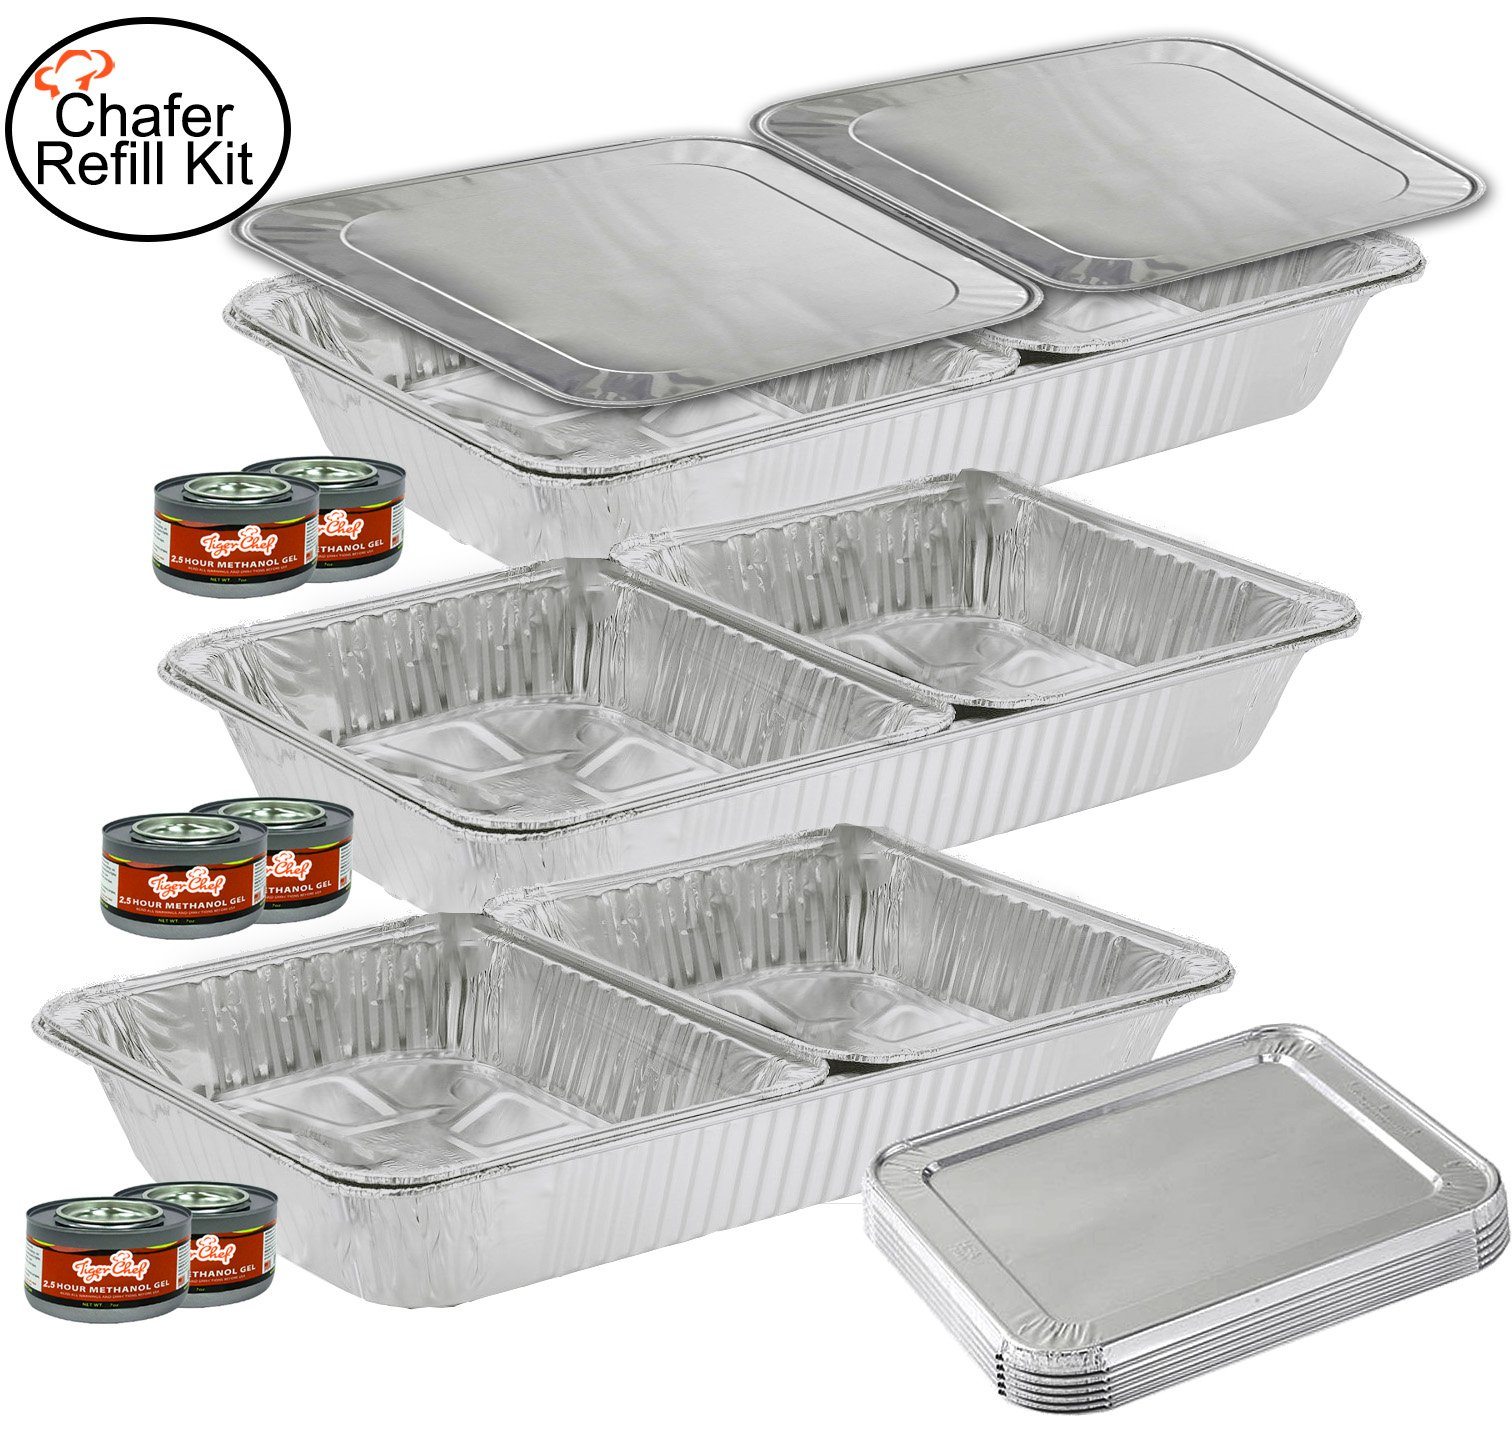 TigerChef TC-20520 Chafer Pans Set, Includes 3 Full Size Aluminum Steam Table Pans, 6 Half Size Aluminum Foil Pans with 6 Lids and 6 Gel Fuel Cans